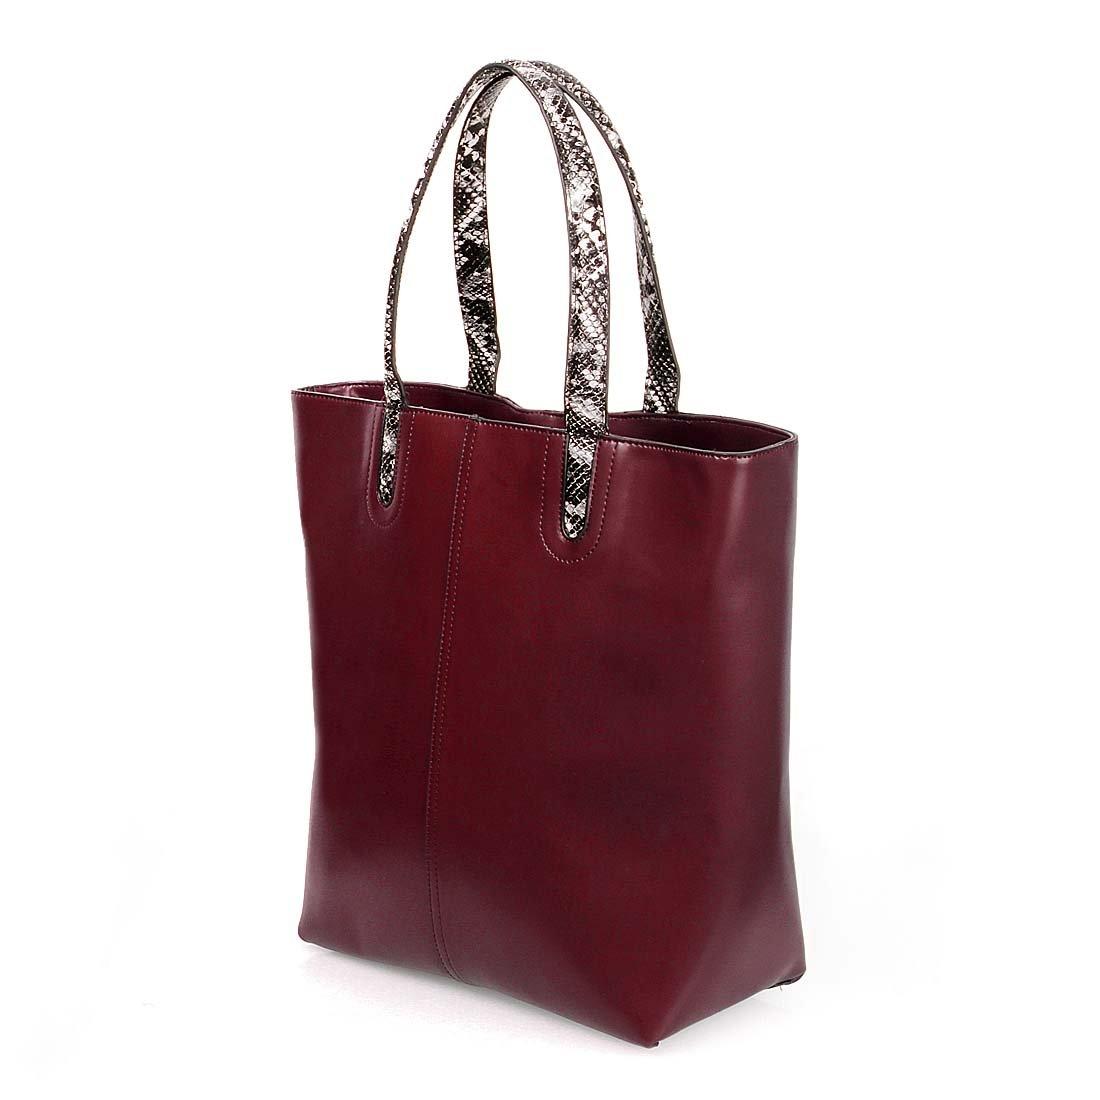 9c9367fd4e BMC Womens Wine Red PU Leather Faux Snakeskin Top Handle Fashion Tote  Canvas Purse Handbag Set  Amazon.co.uk  Shoes   Bags